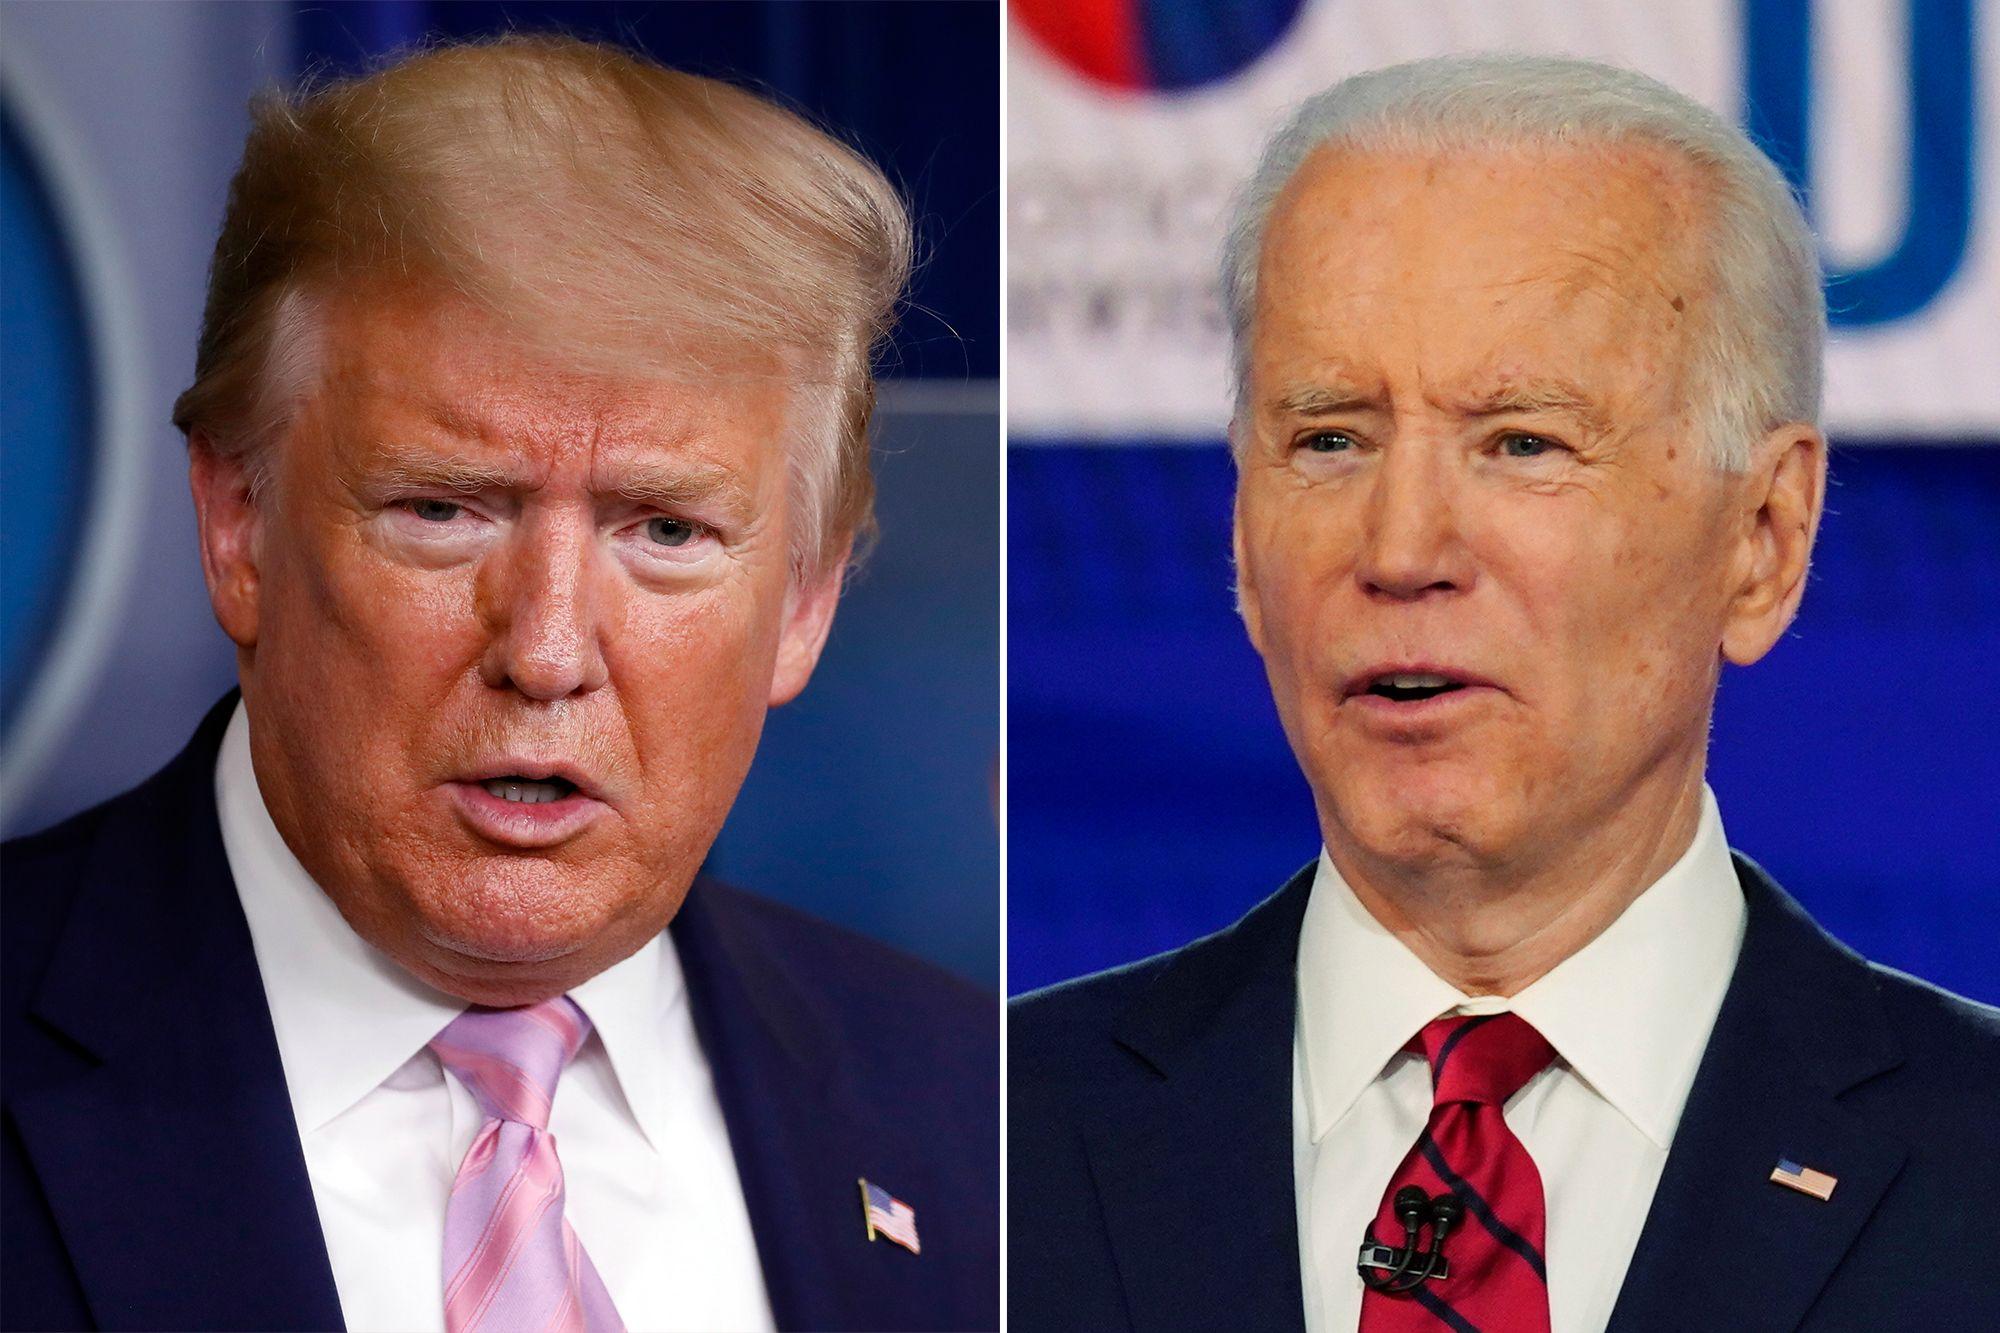 Donald Trump and Joe Biden Blank Template - Imgflip